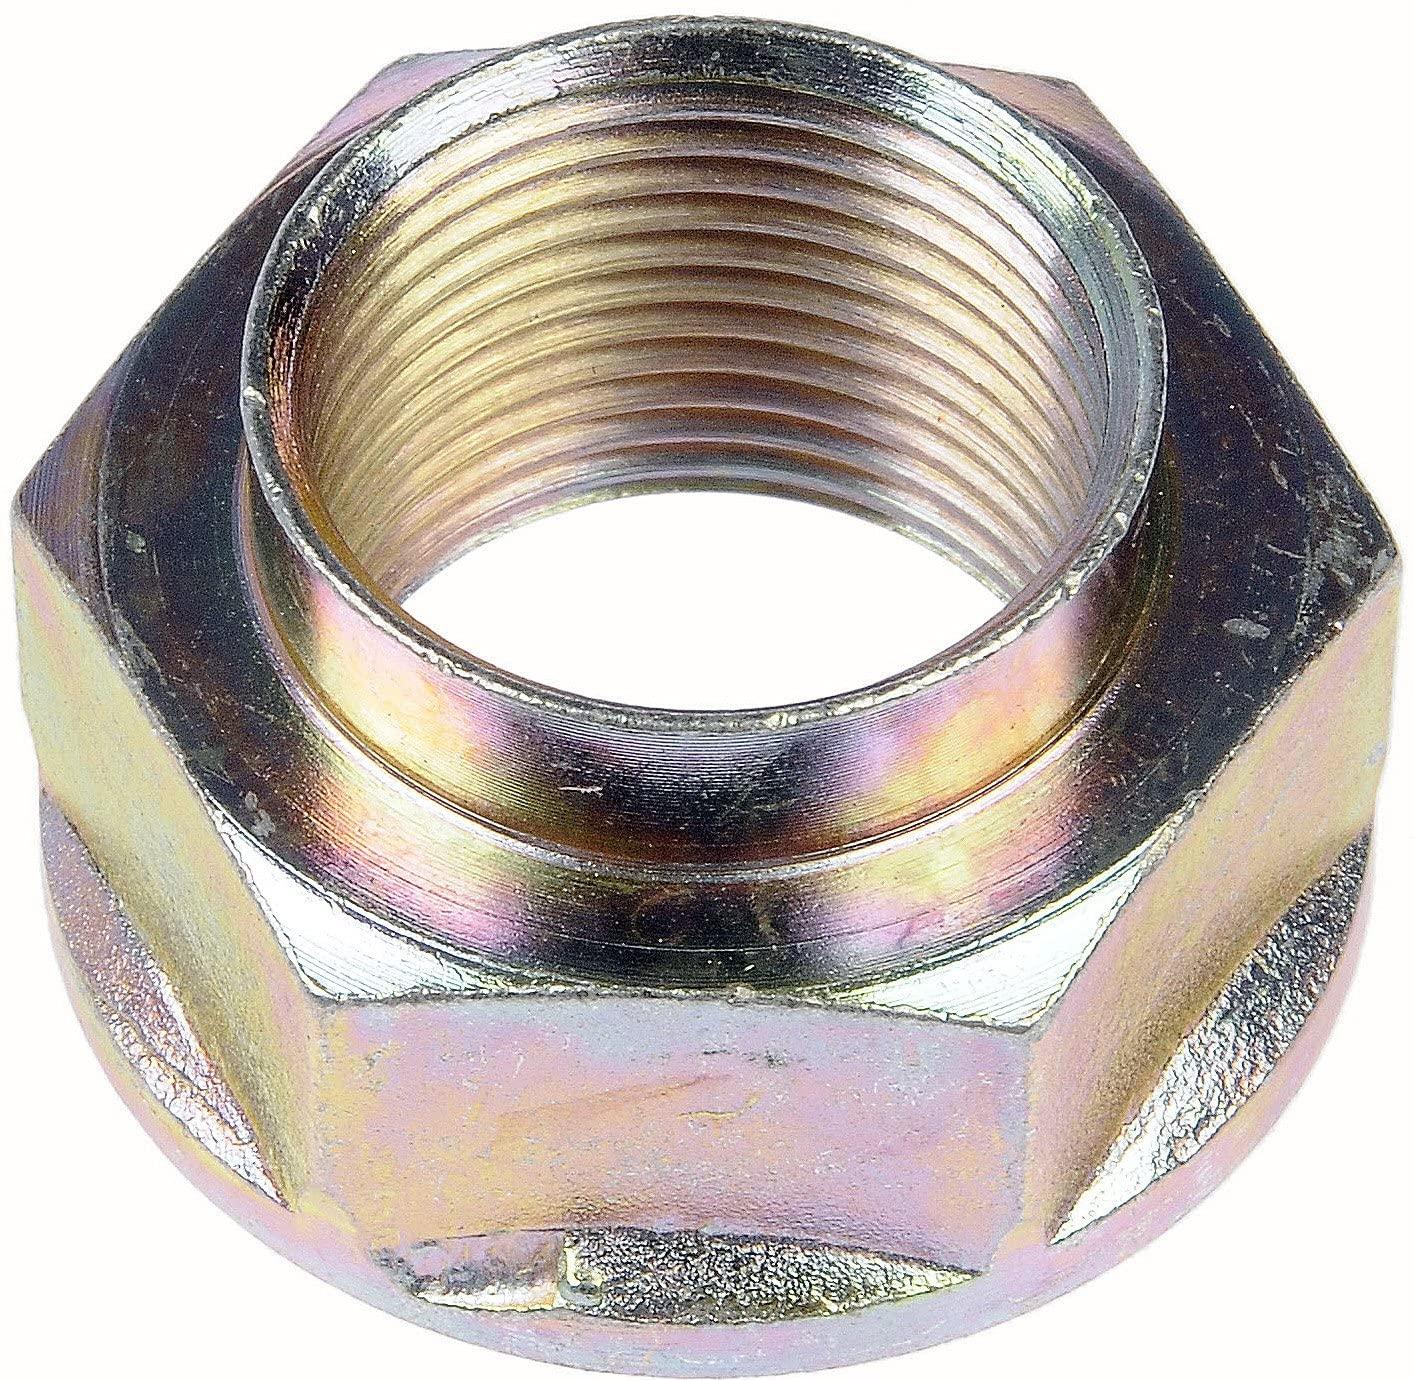 Dorman HELP! 05172 Spindle Lock Nut Kit